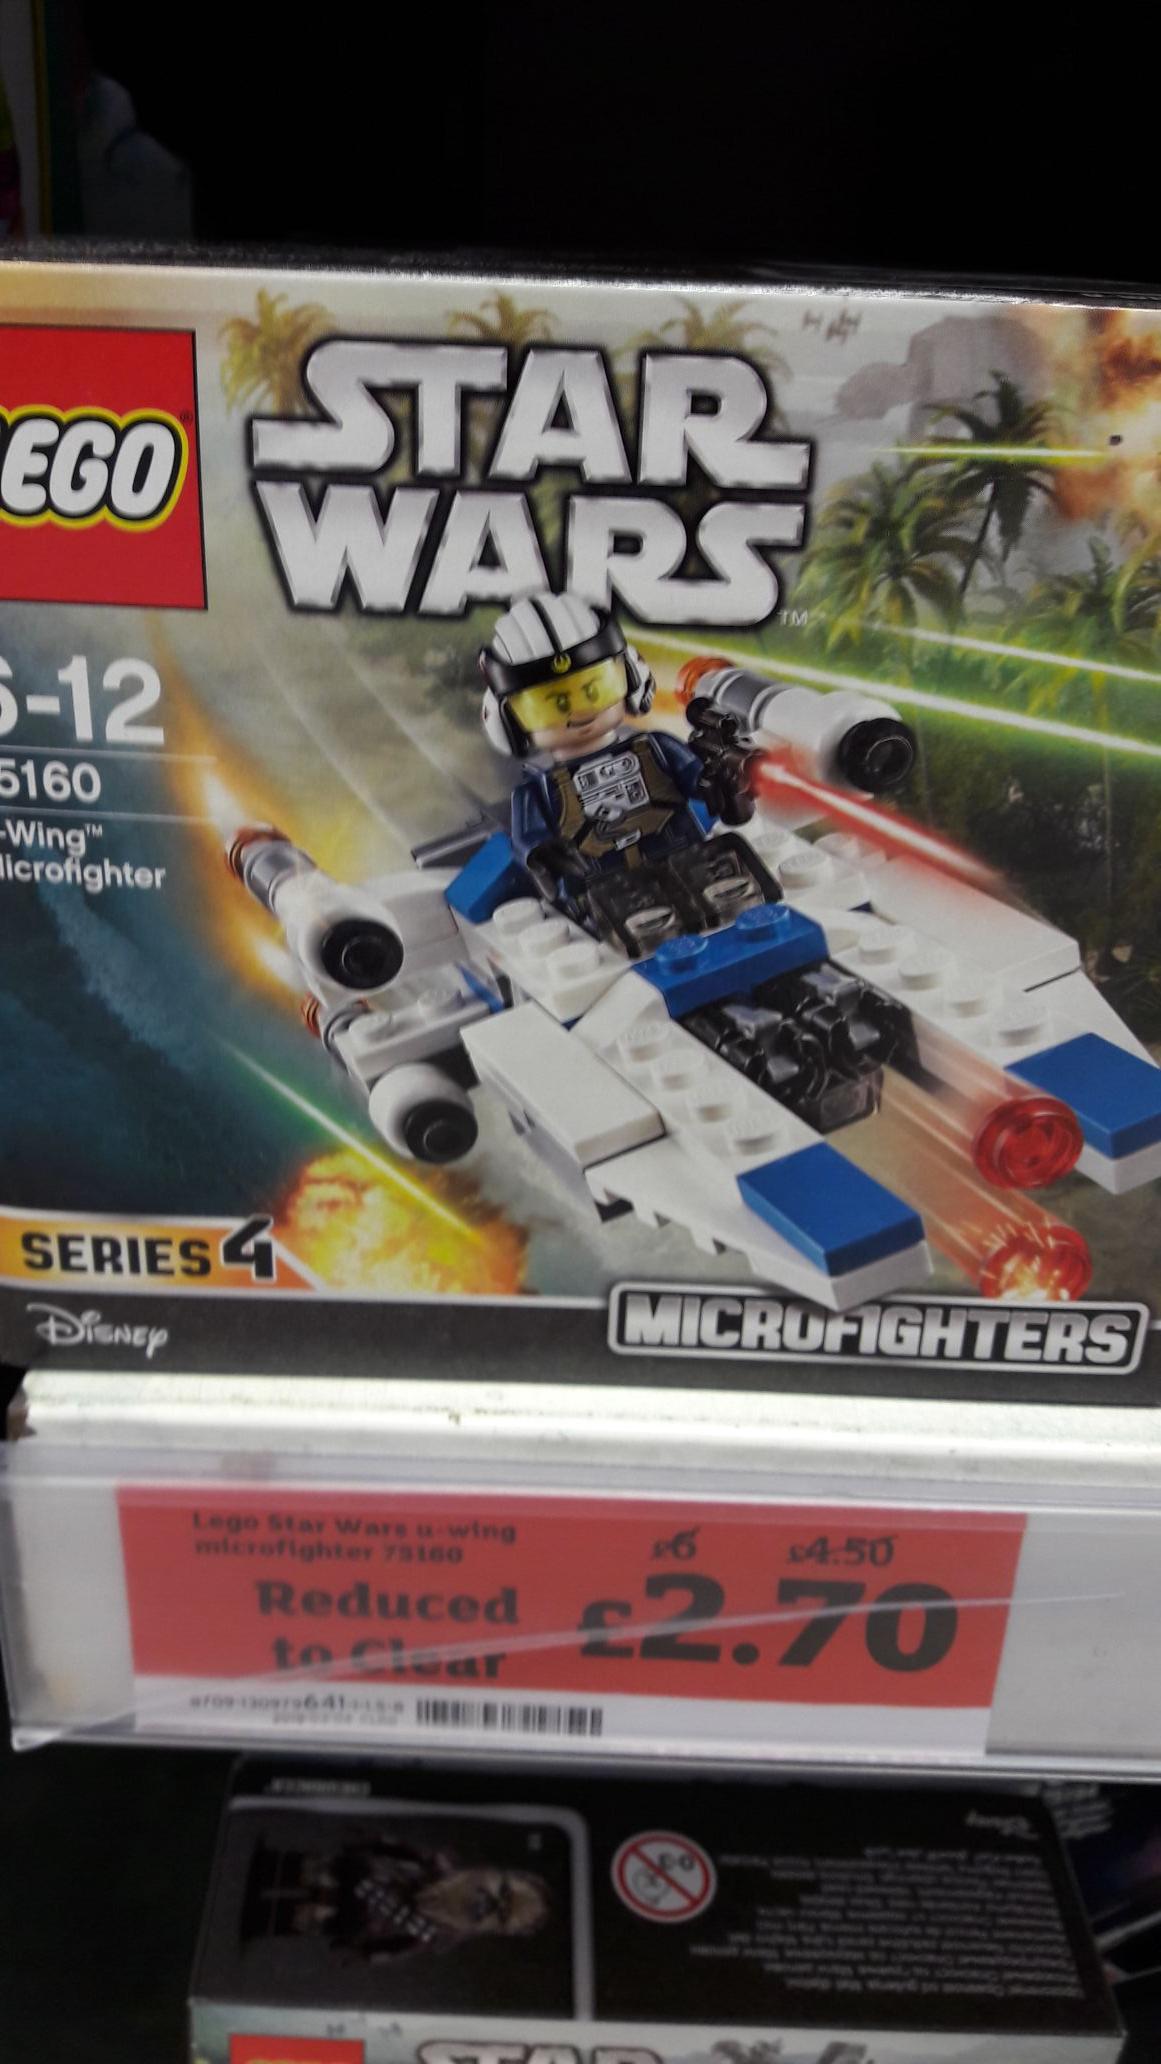 LEGO 75160 U Wing Microfighter - £2.70 instore @ Sainsbury's (Birchills)